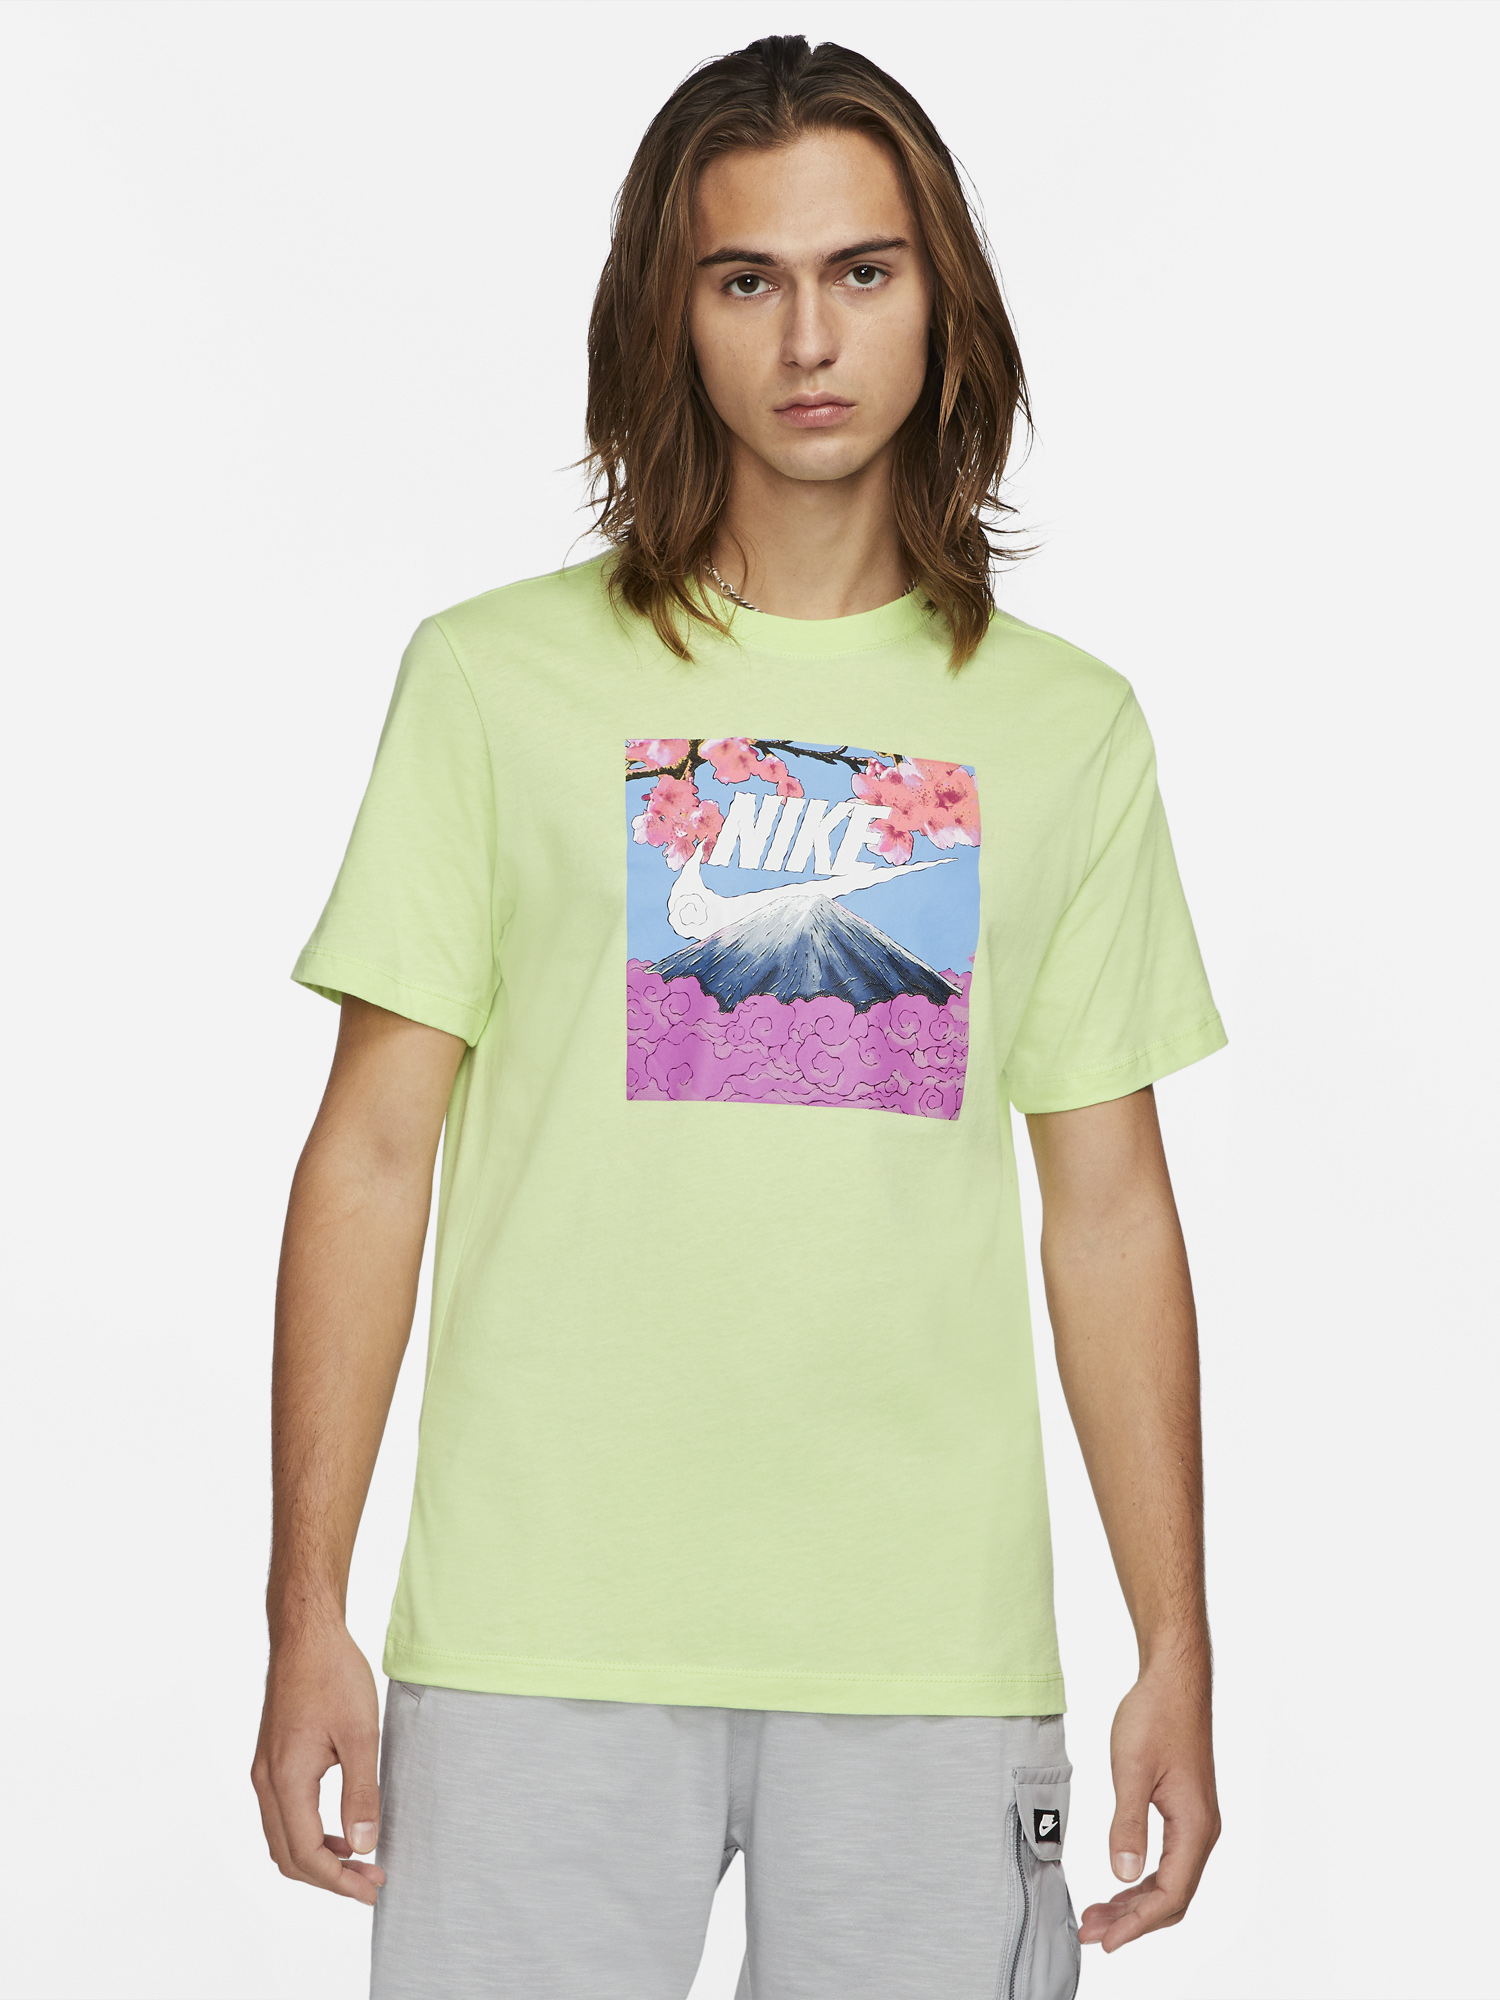 nike-air-huarache-volt-magenta-shirt